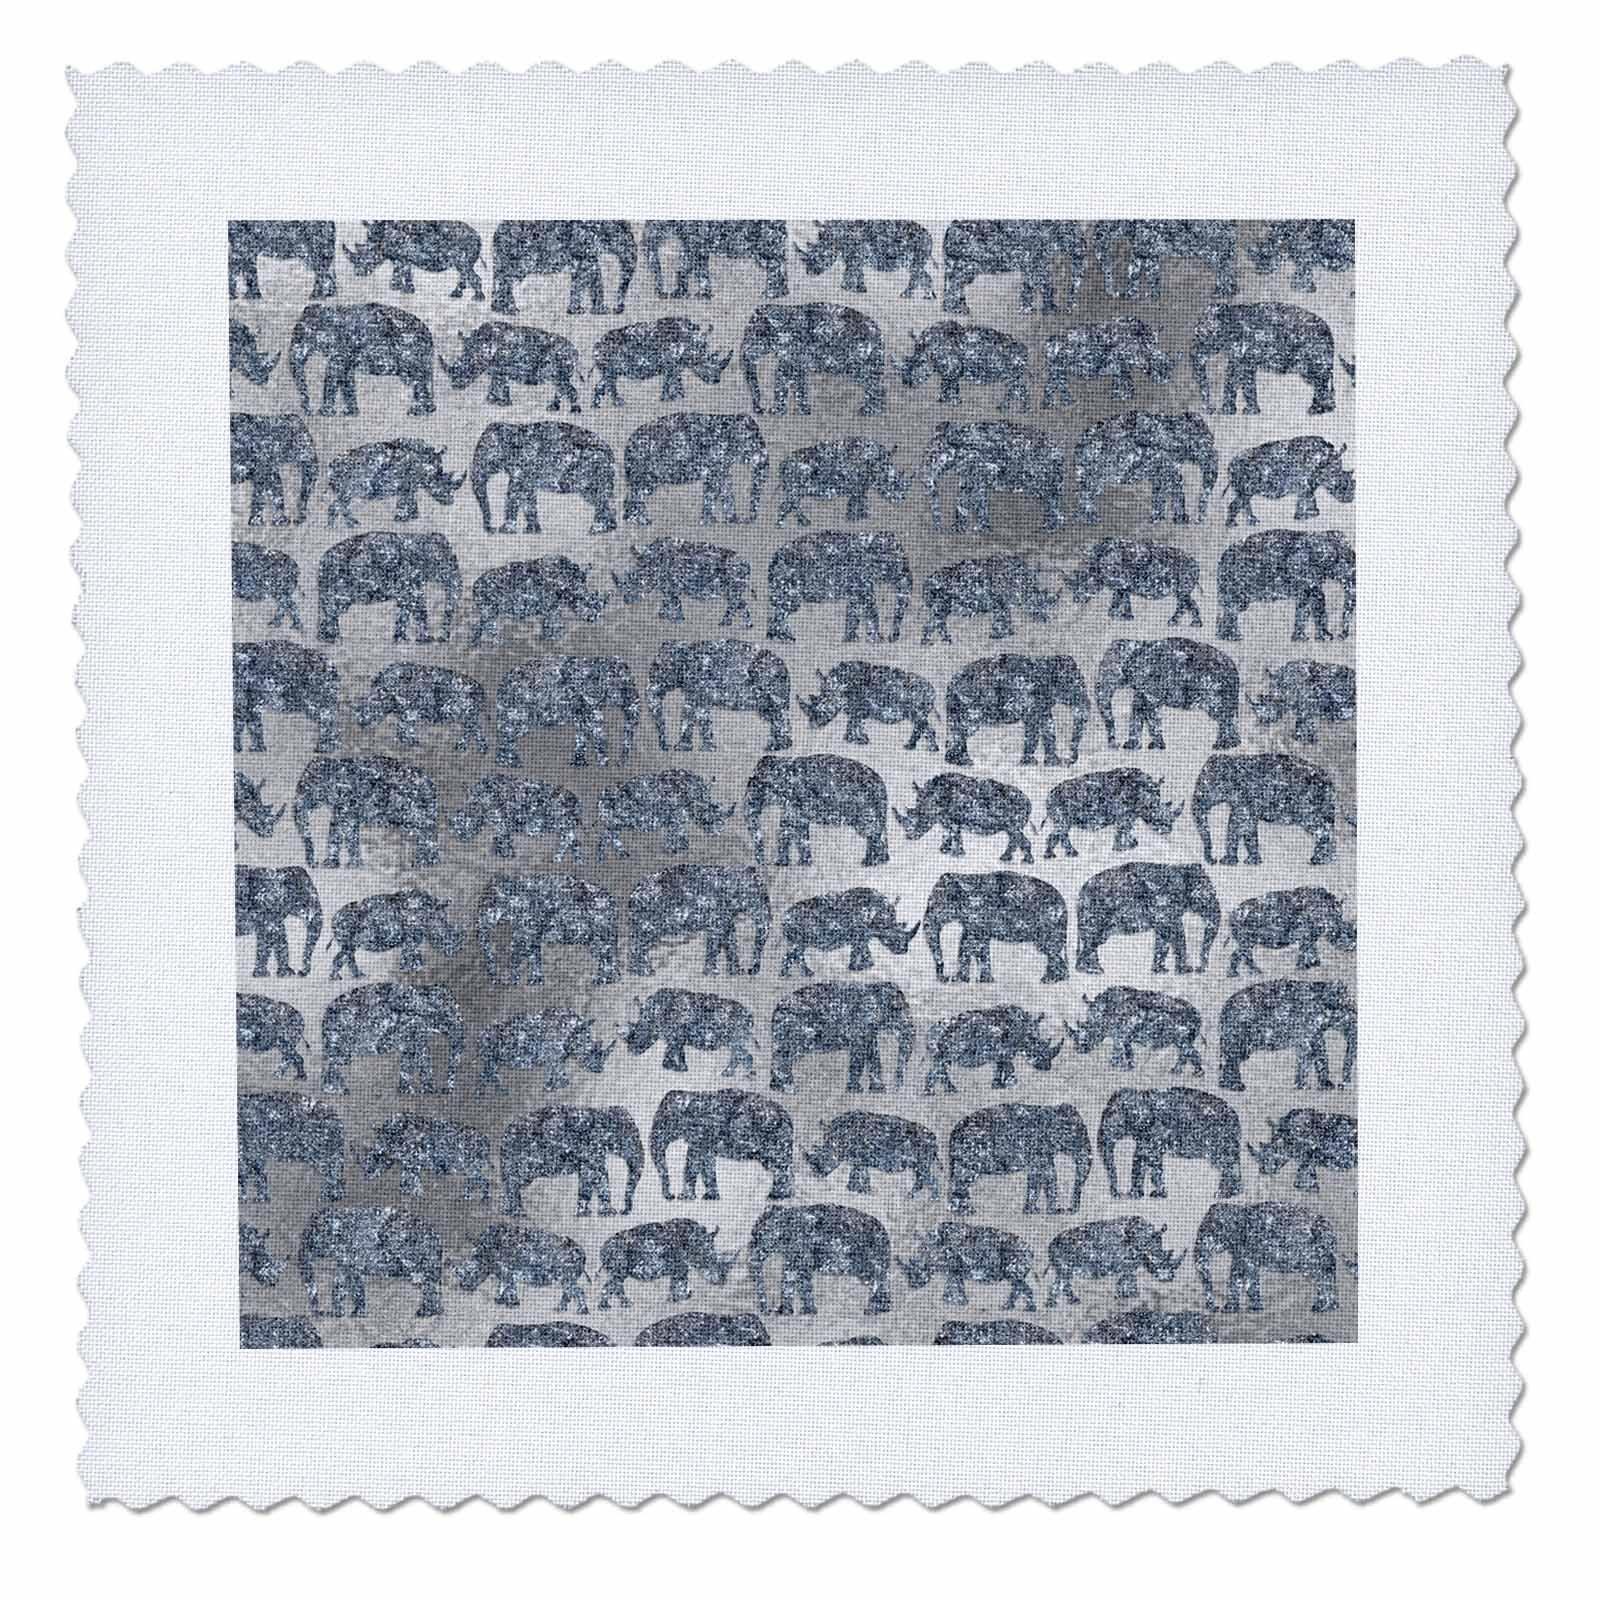 3dRose Uta Naumann Faux Glitter Pattern - Luxury Silver Shiny Chic Animal Elephant Africa Safari Pattern - 12x12 inch quilt square (qs_269042_4)